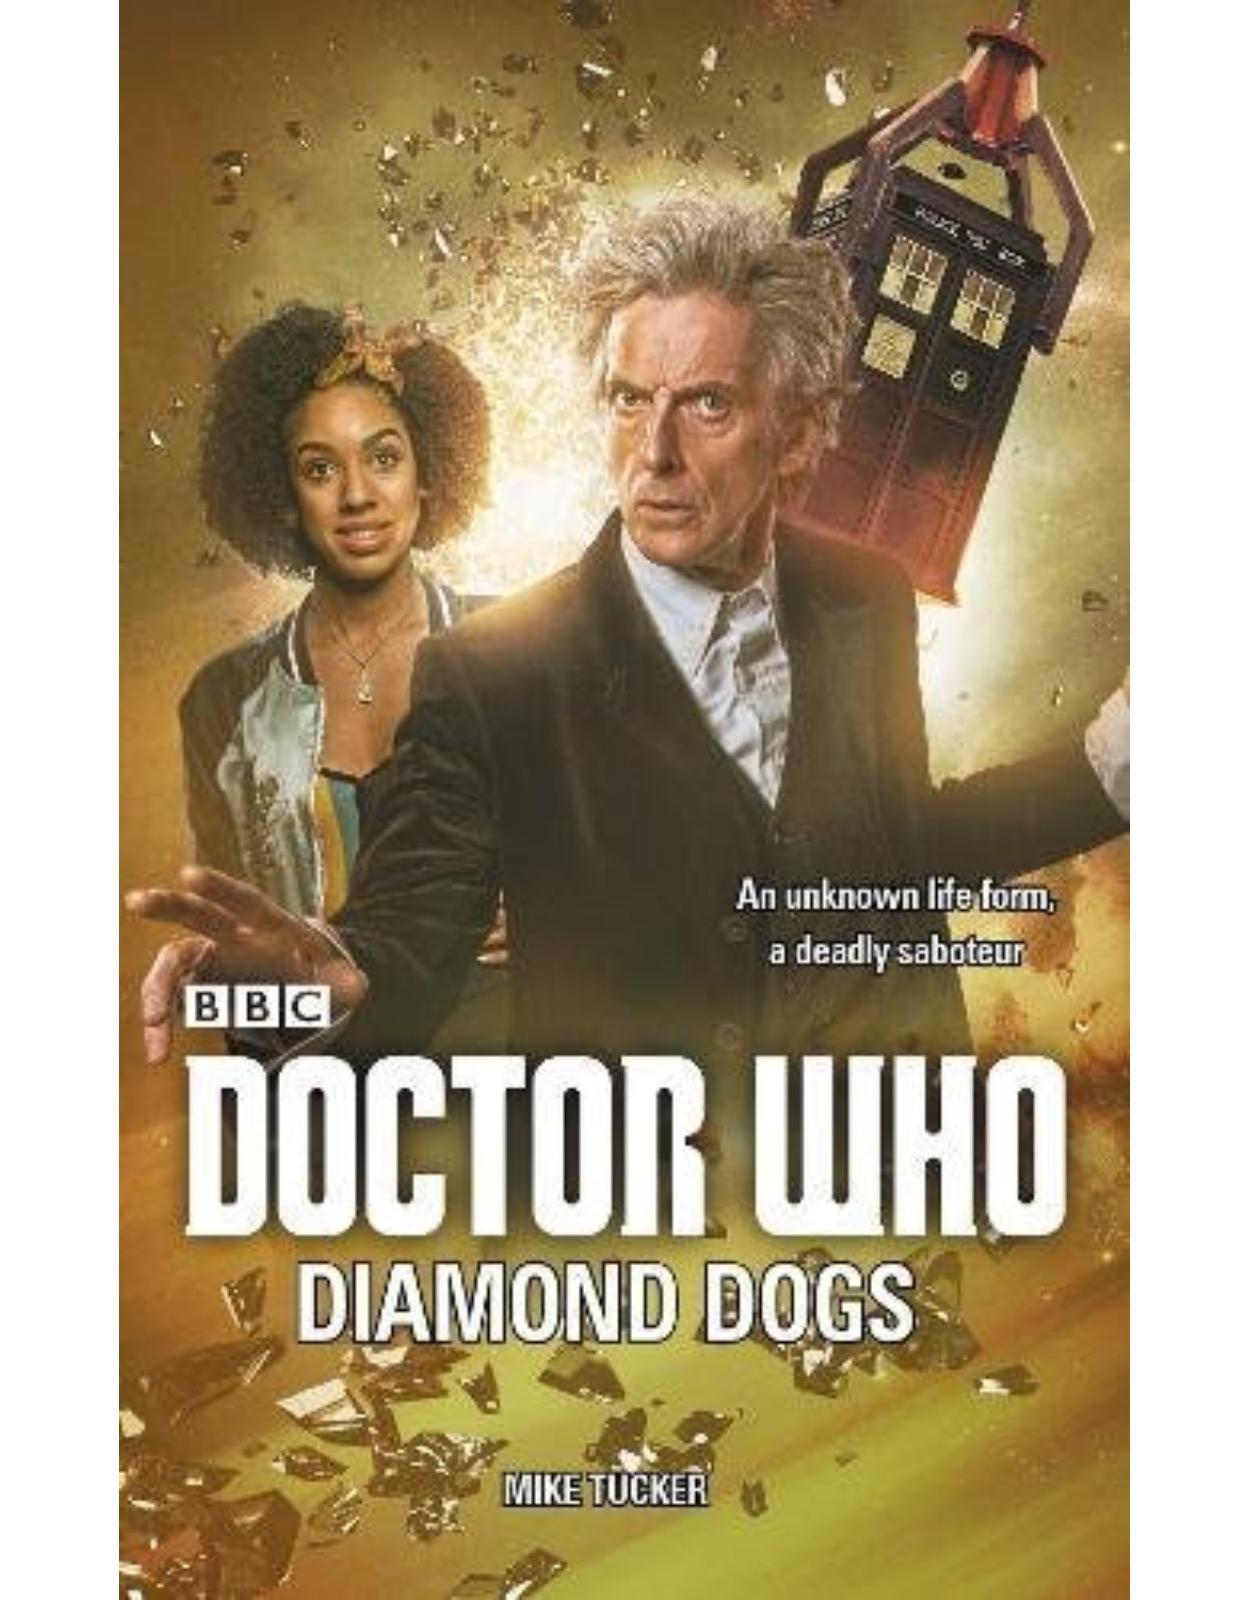 Doctor Who: Diamond Dogs